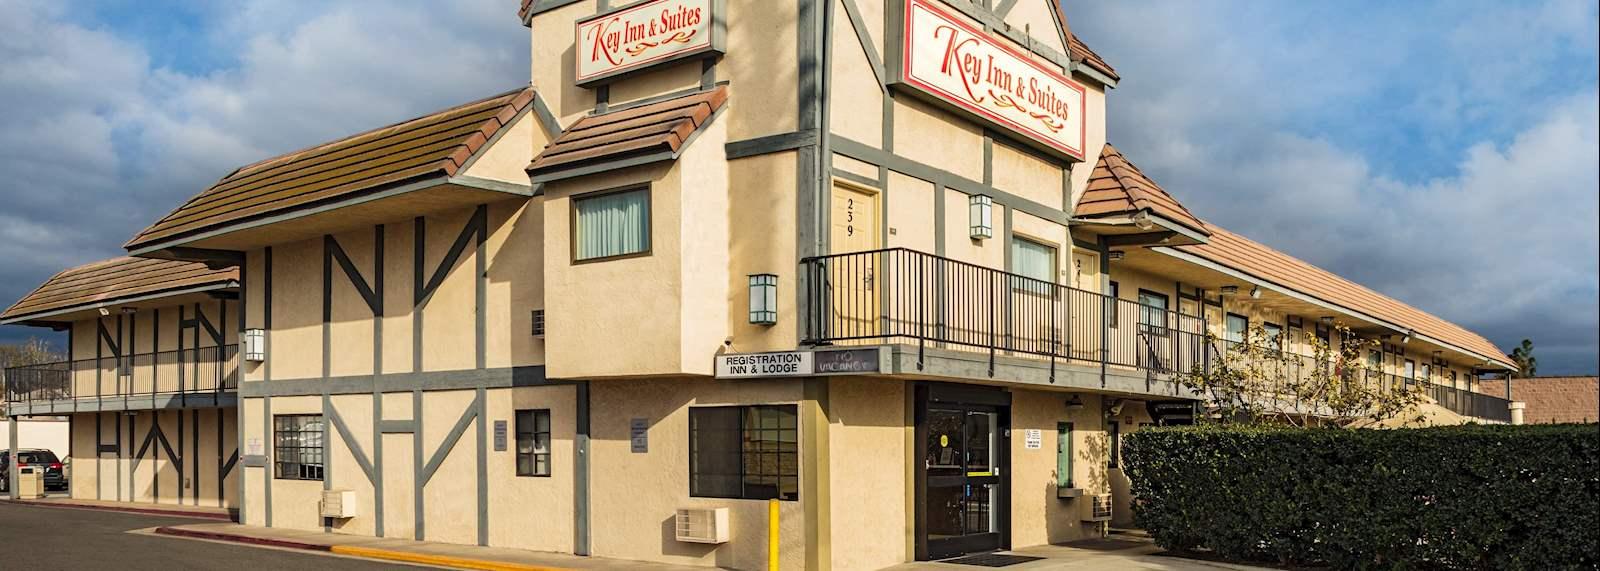 Key inn and suites Tustin - Exterior